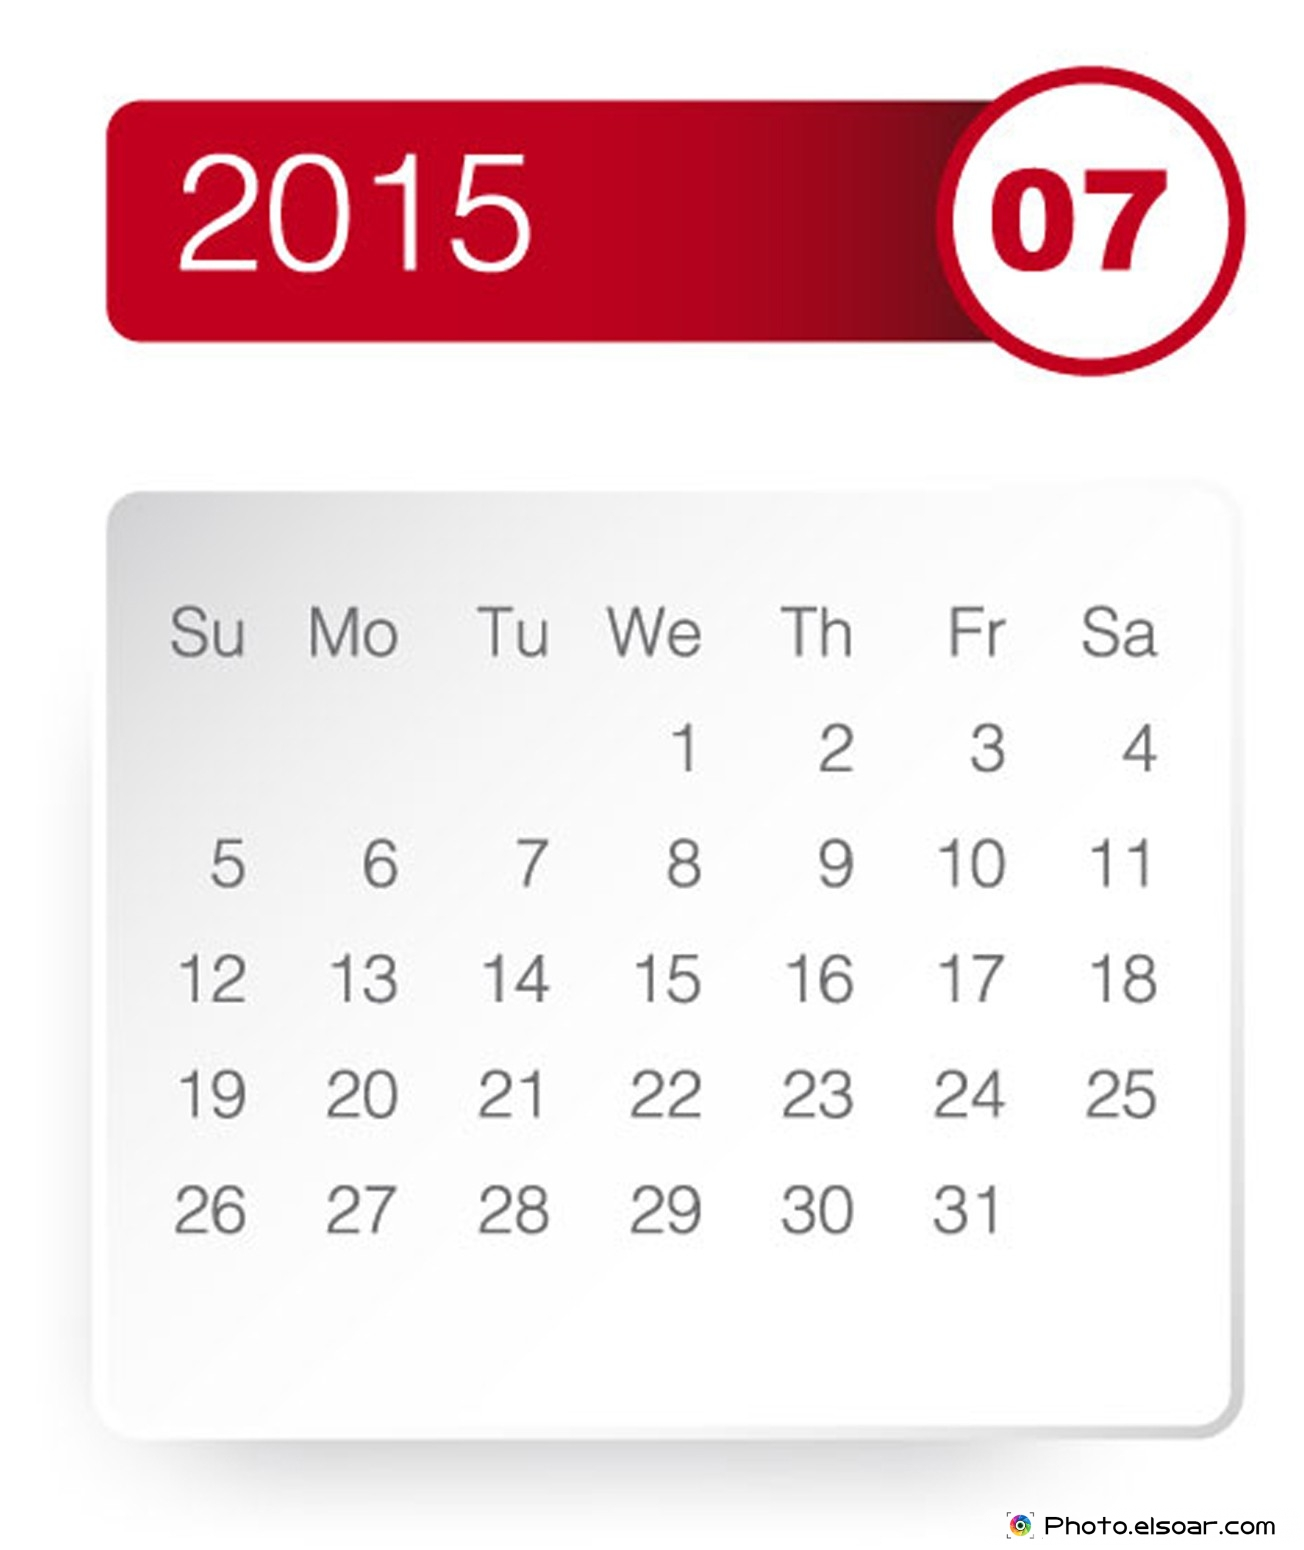 Calendar clipart july image transparent stock Calendar July 2015 Clipart - Clipart Kid image transparent stock